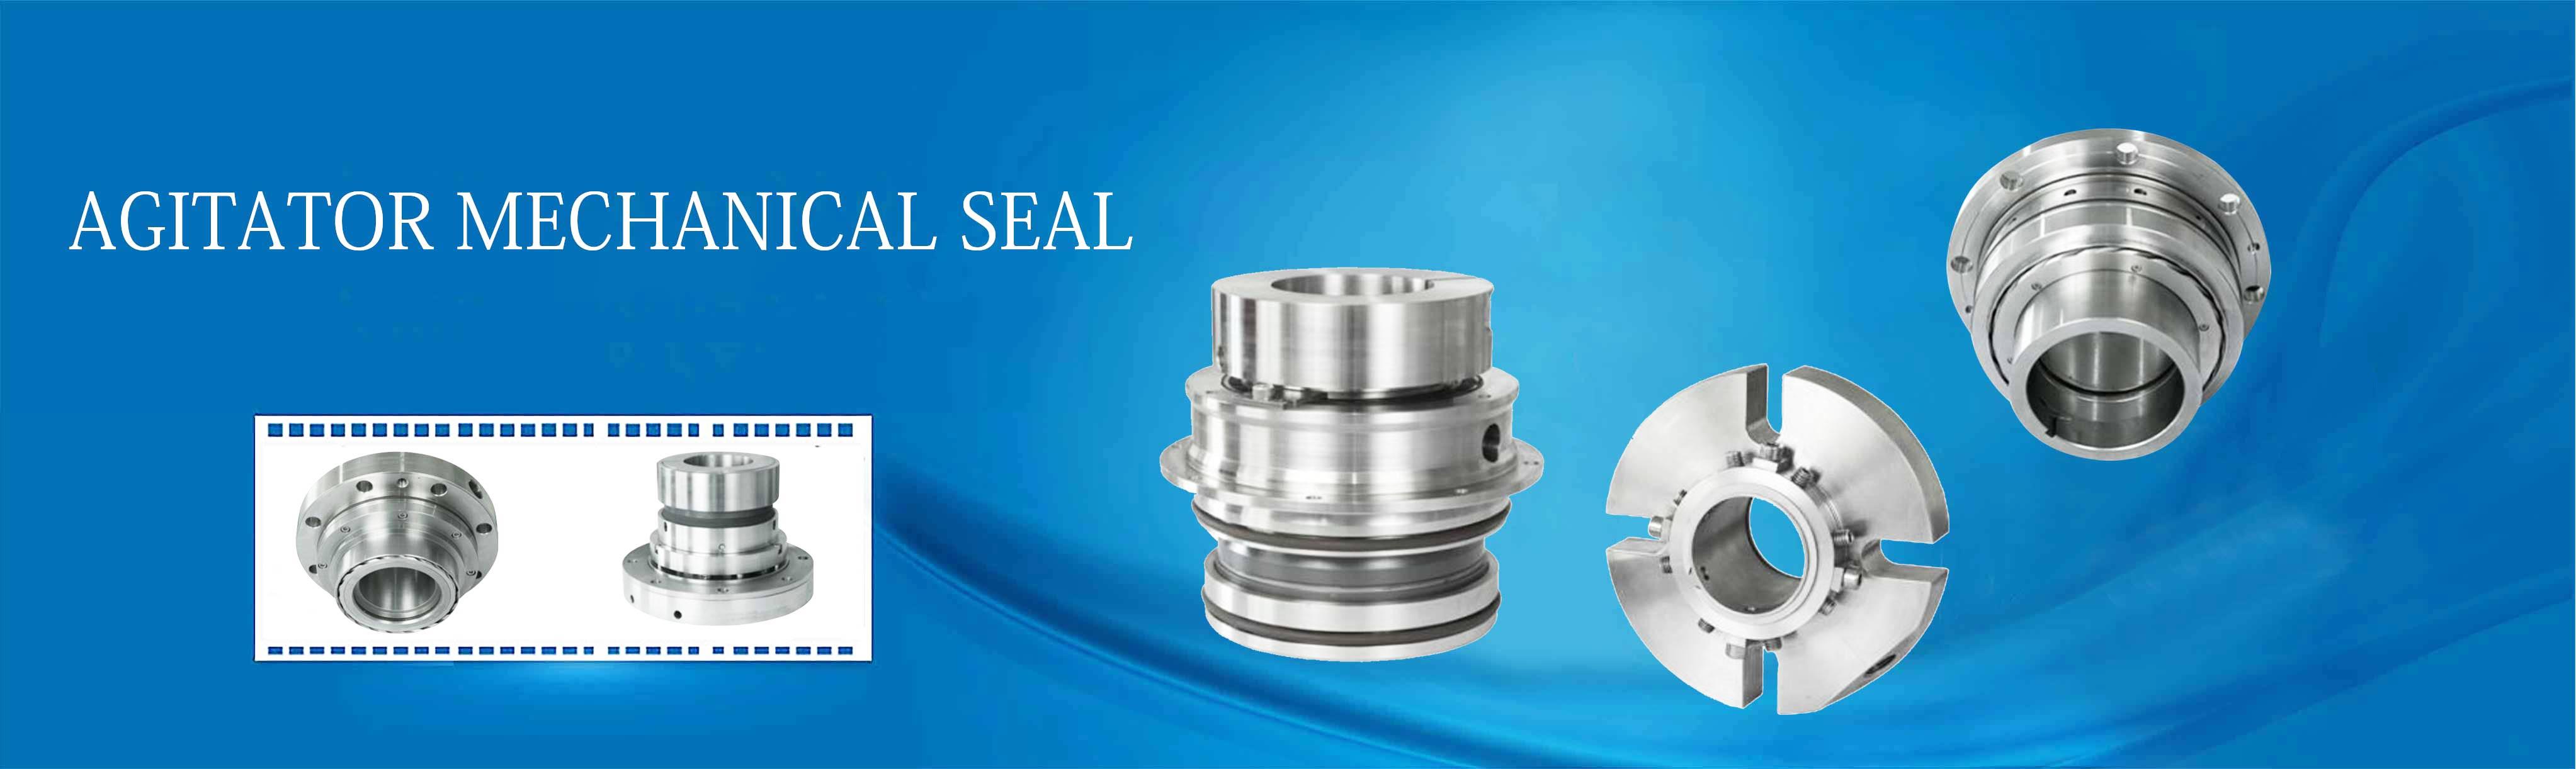 agitaor mechanical seal